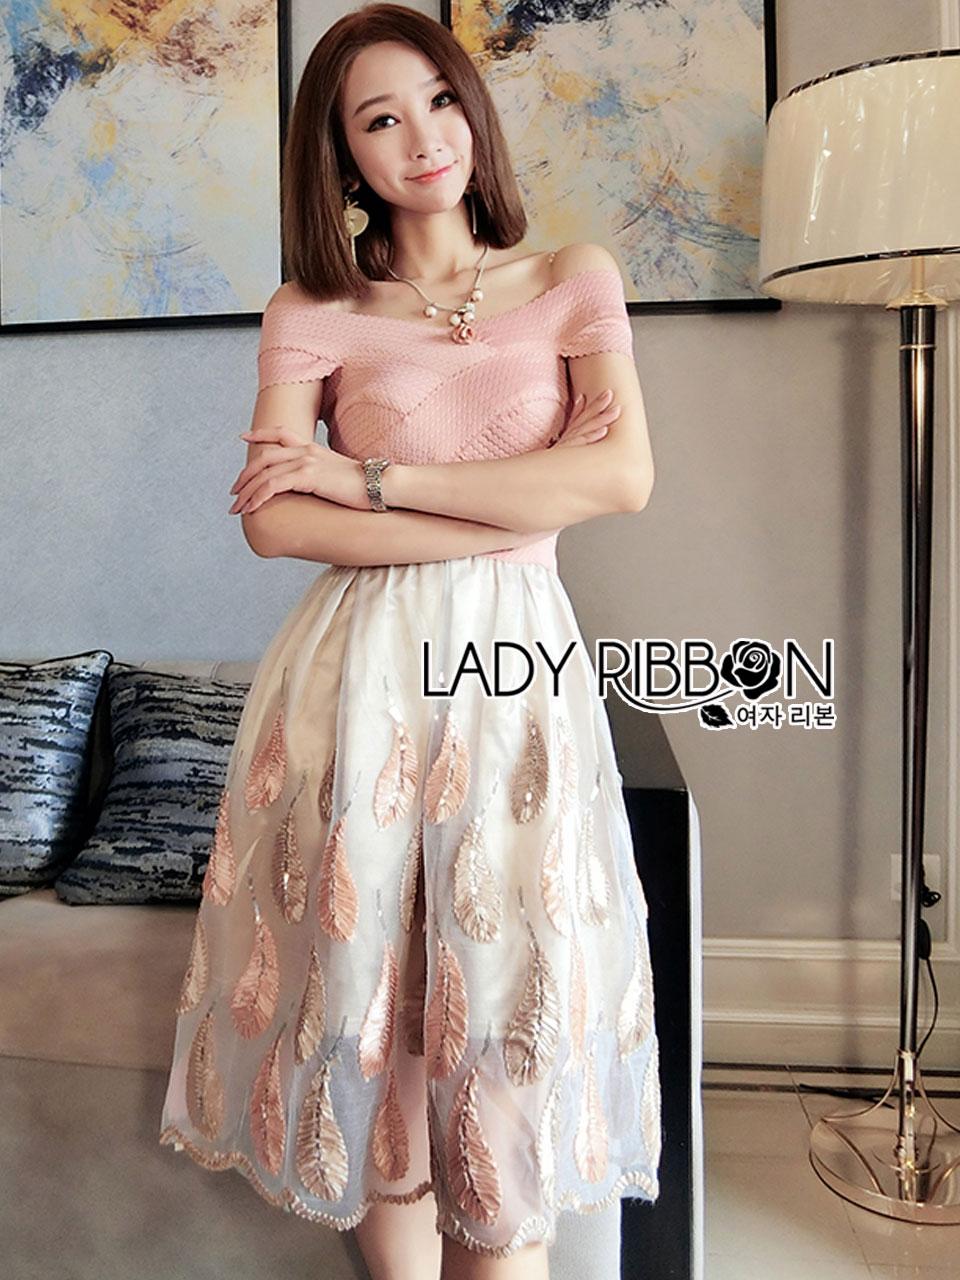 Courtney Feather Embroidered Silk Organza Dress